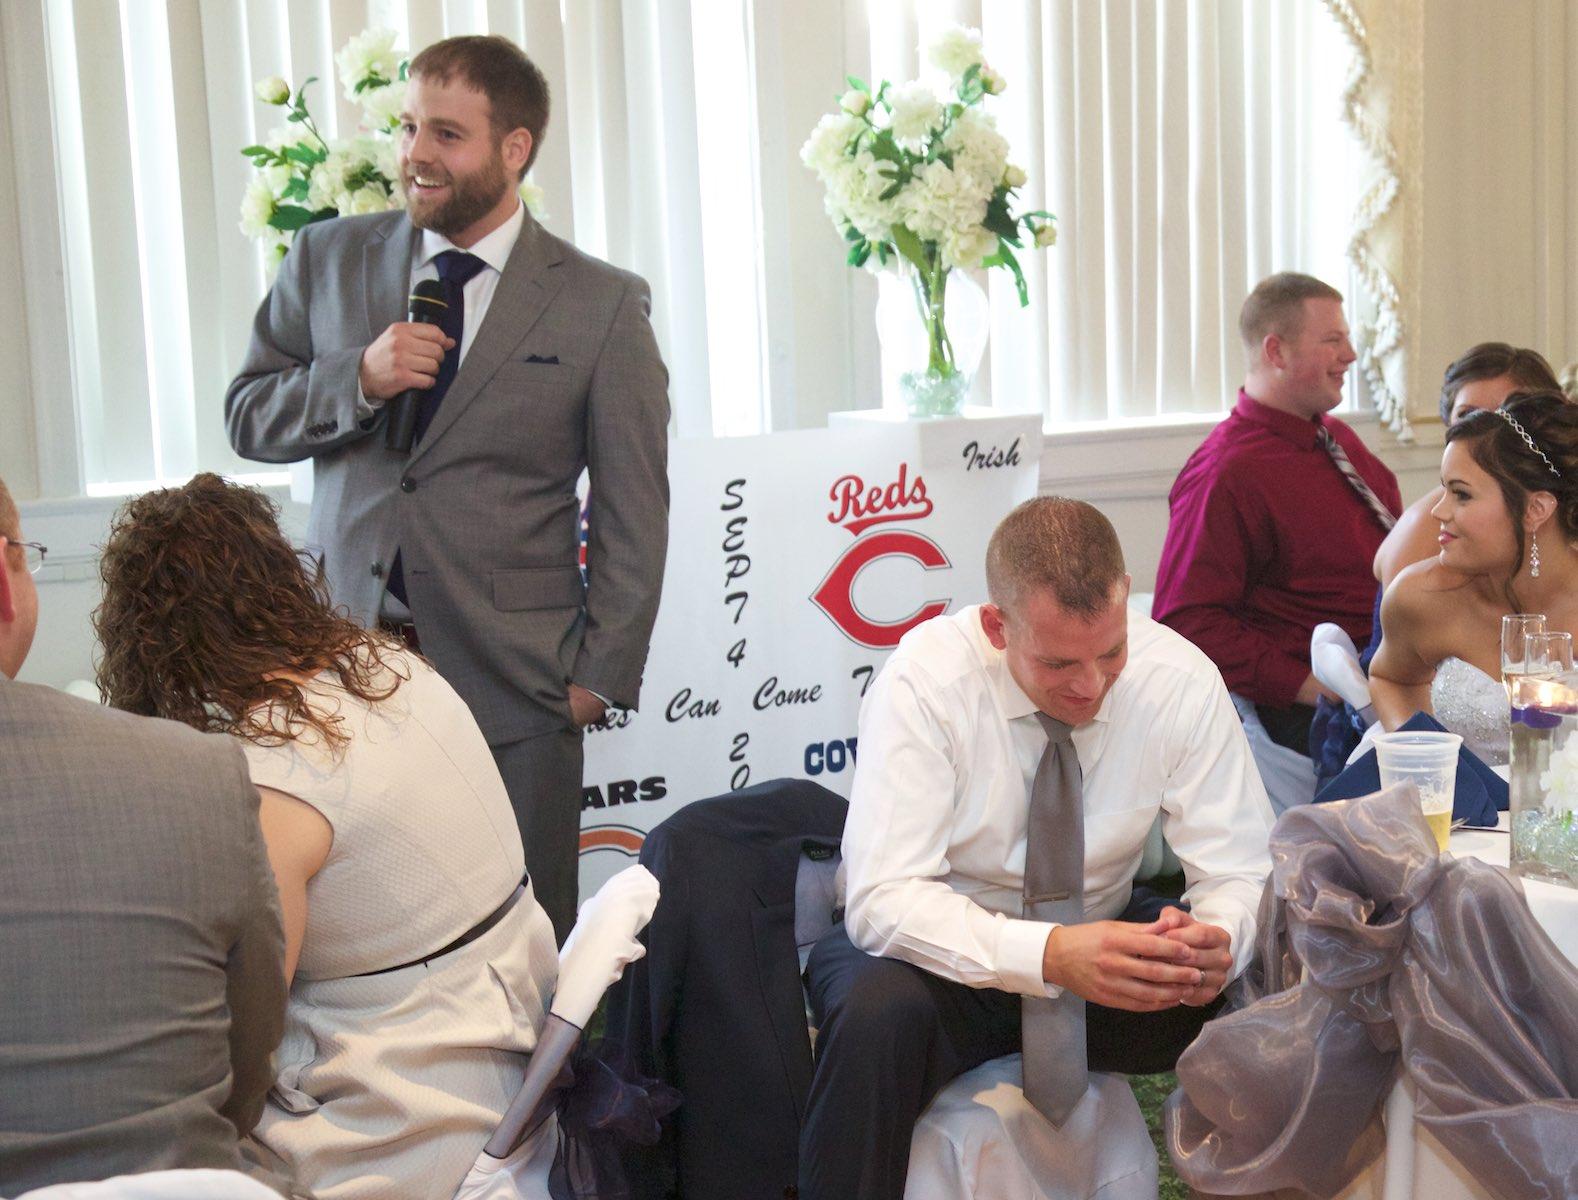 Jeremy's brother gives his best man speech, wedding reception at Hamilton's 110 North East, Jacksonville, Illinois. Wedding photography by Steve & Tiffany Warmowski.